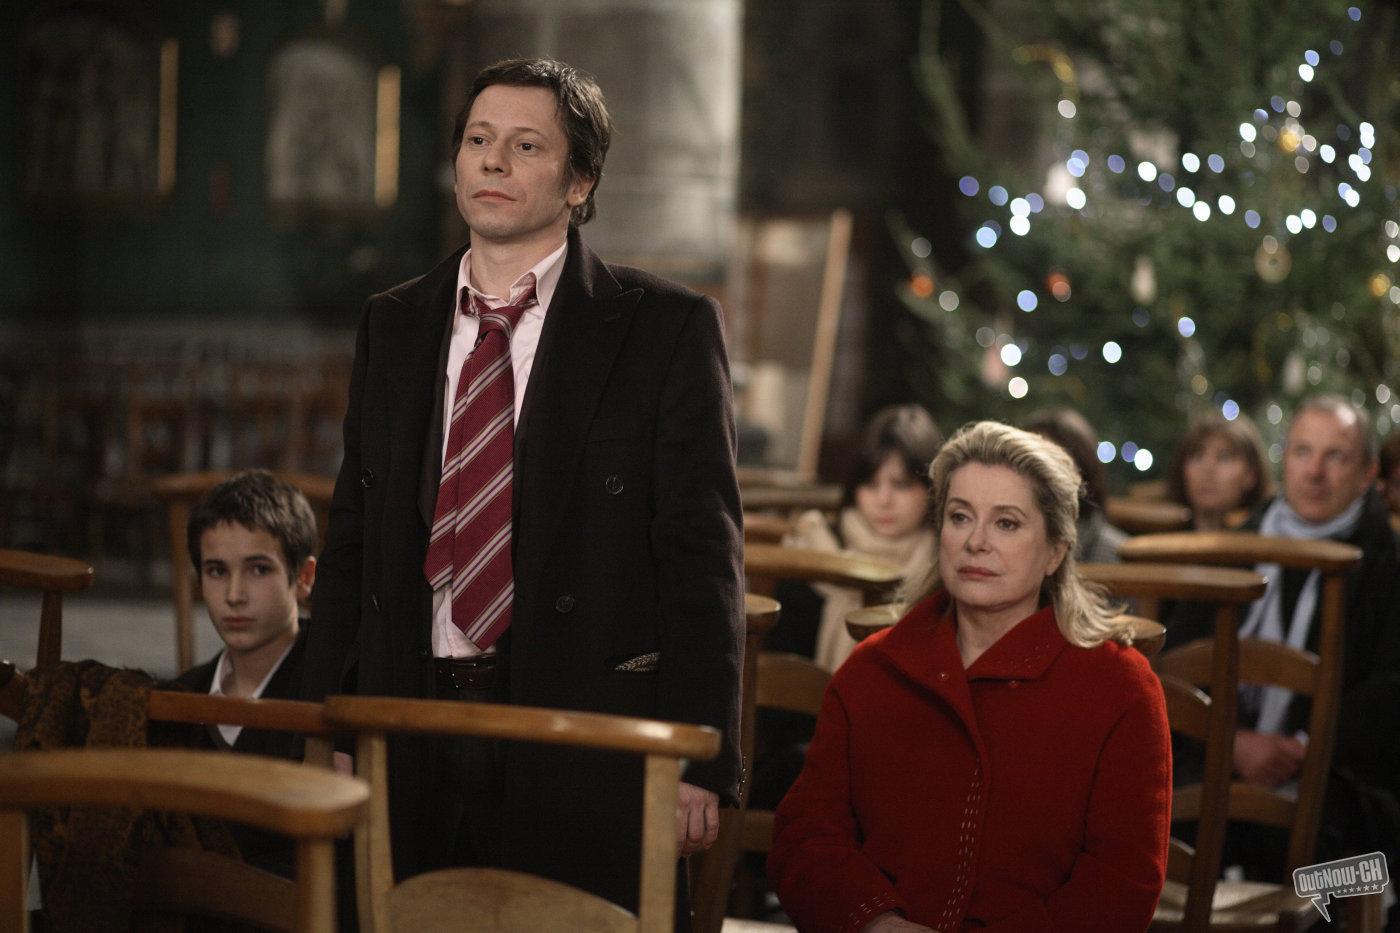 A Christmas Tale / Un conte de Noël (2008)